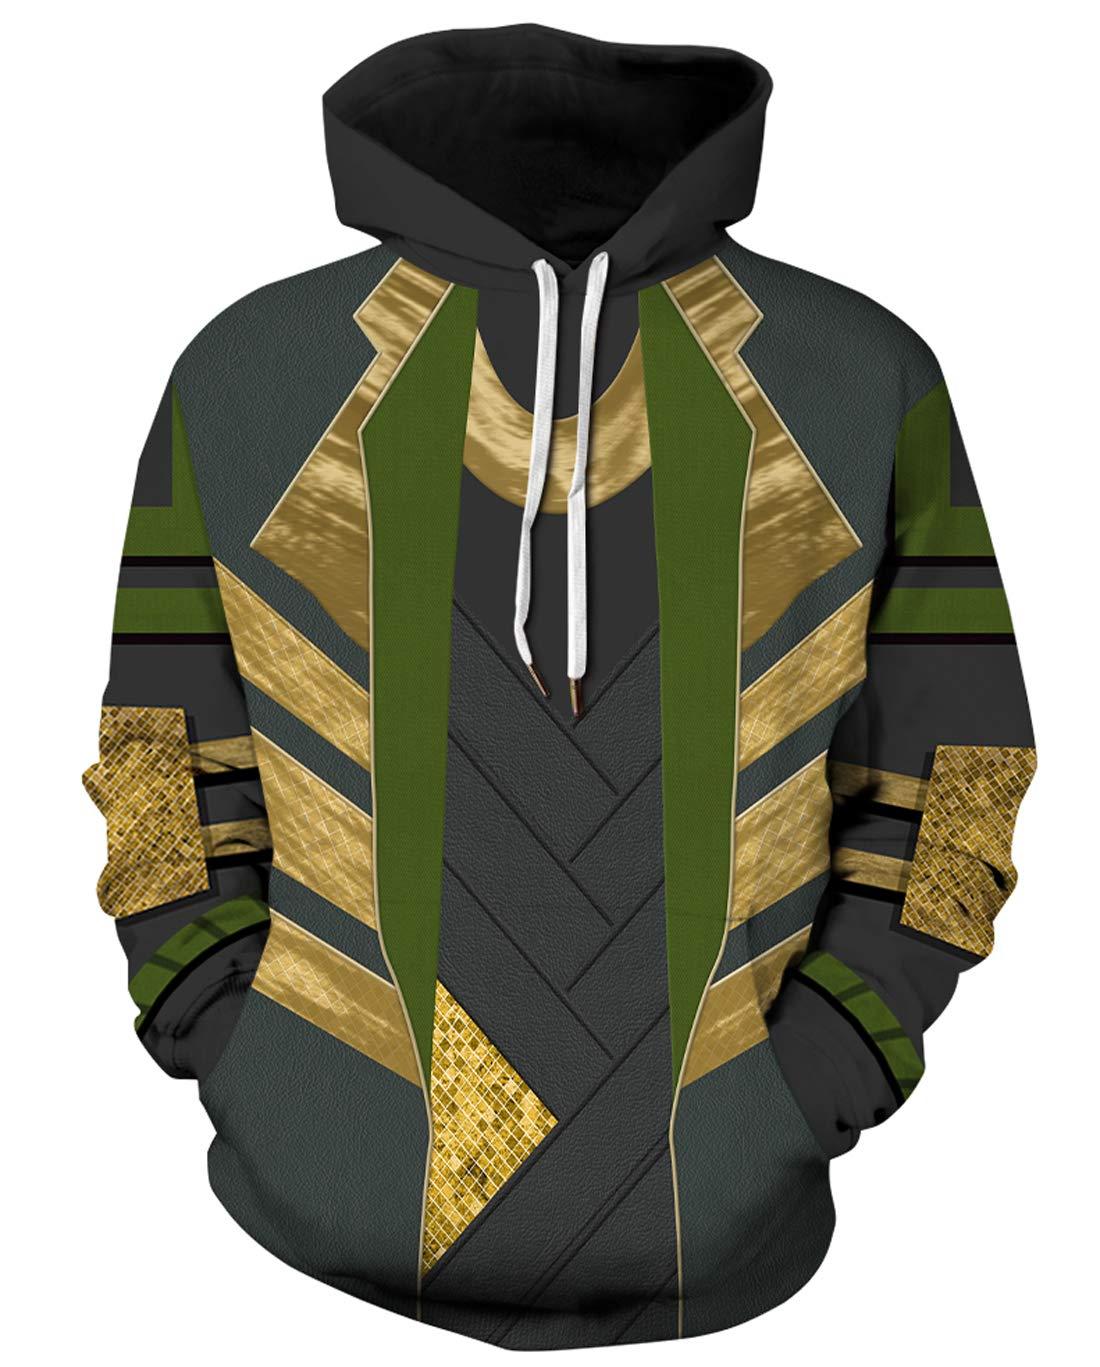 URVIP Unisex Realistic 3D Print Pullover Sweatshirt Hoodies with Big Pockets QYDM-455 S/M by URVIP